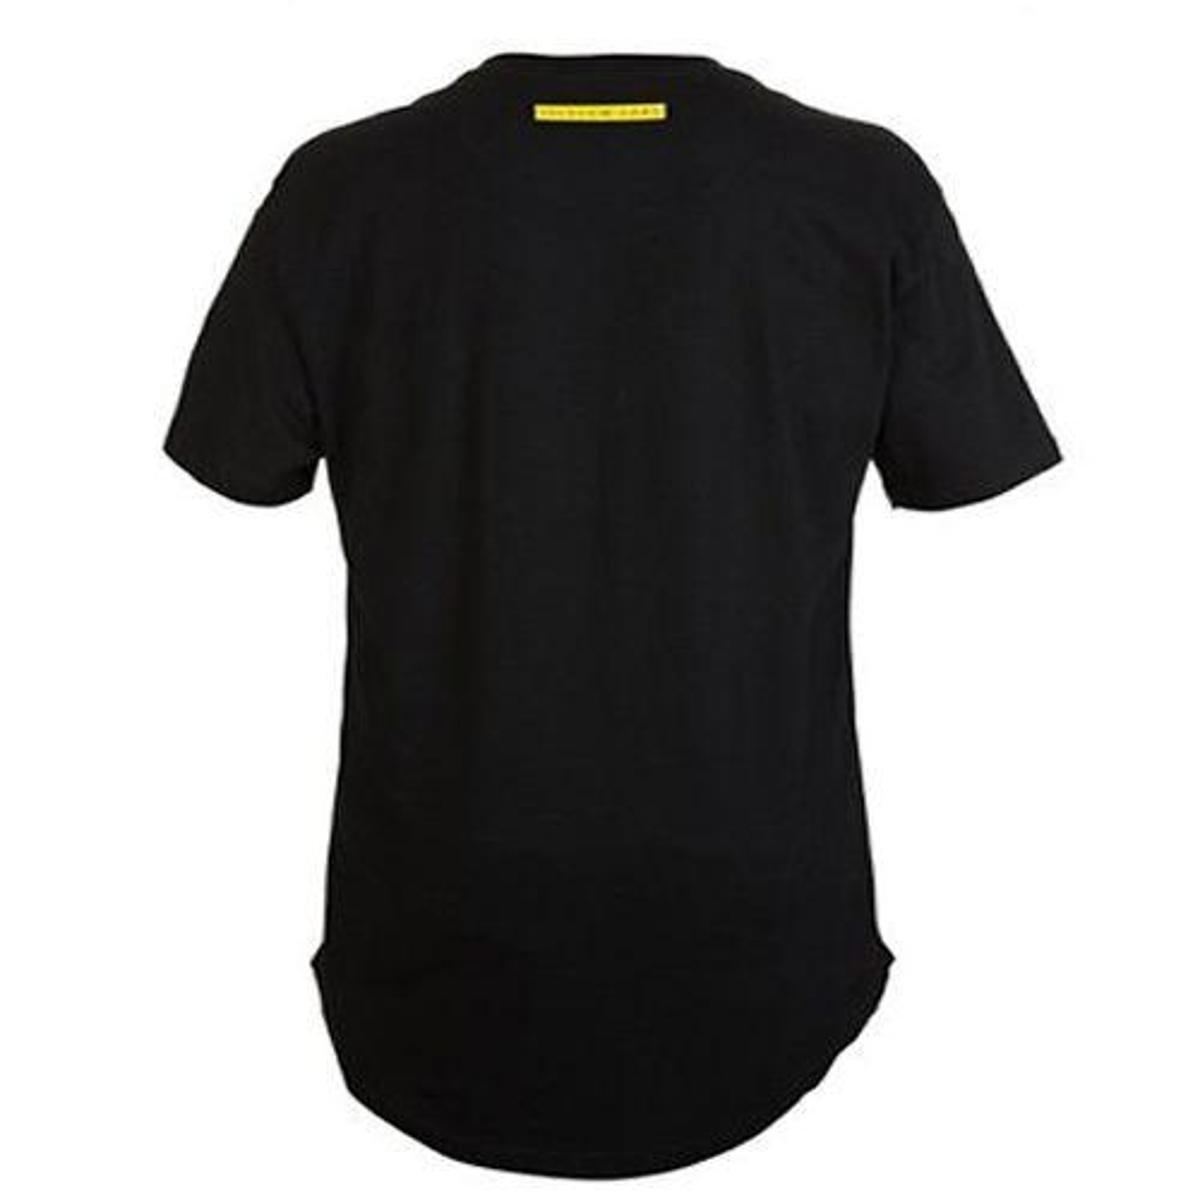 Preto Labs Labs Atlas Long Iridium Long Atlas Camiseta Iridium Preto Camiseta vqEAAx